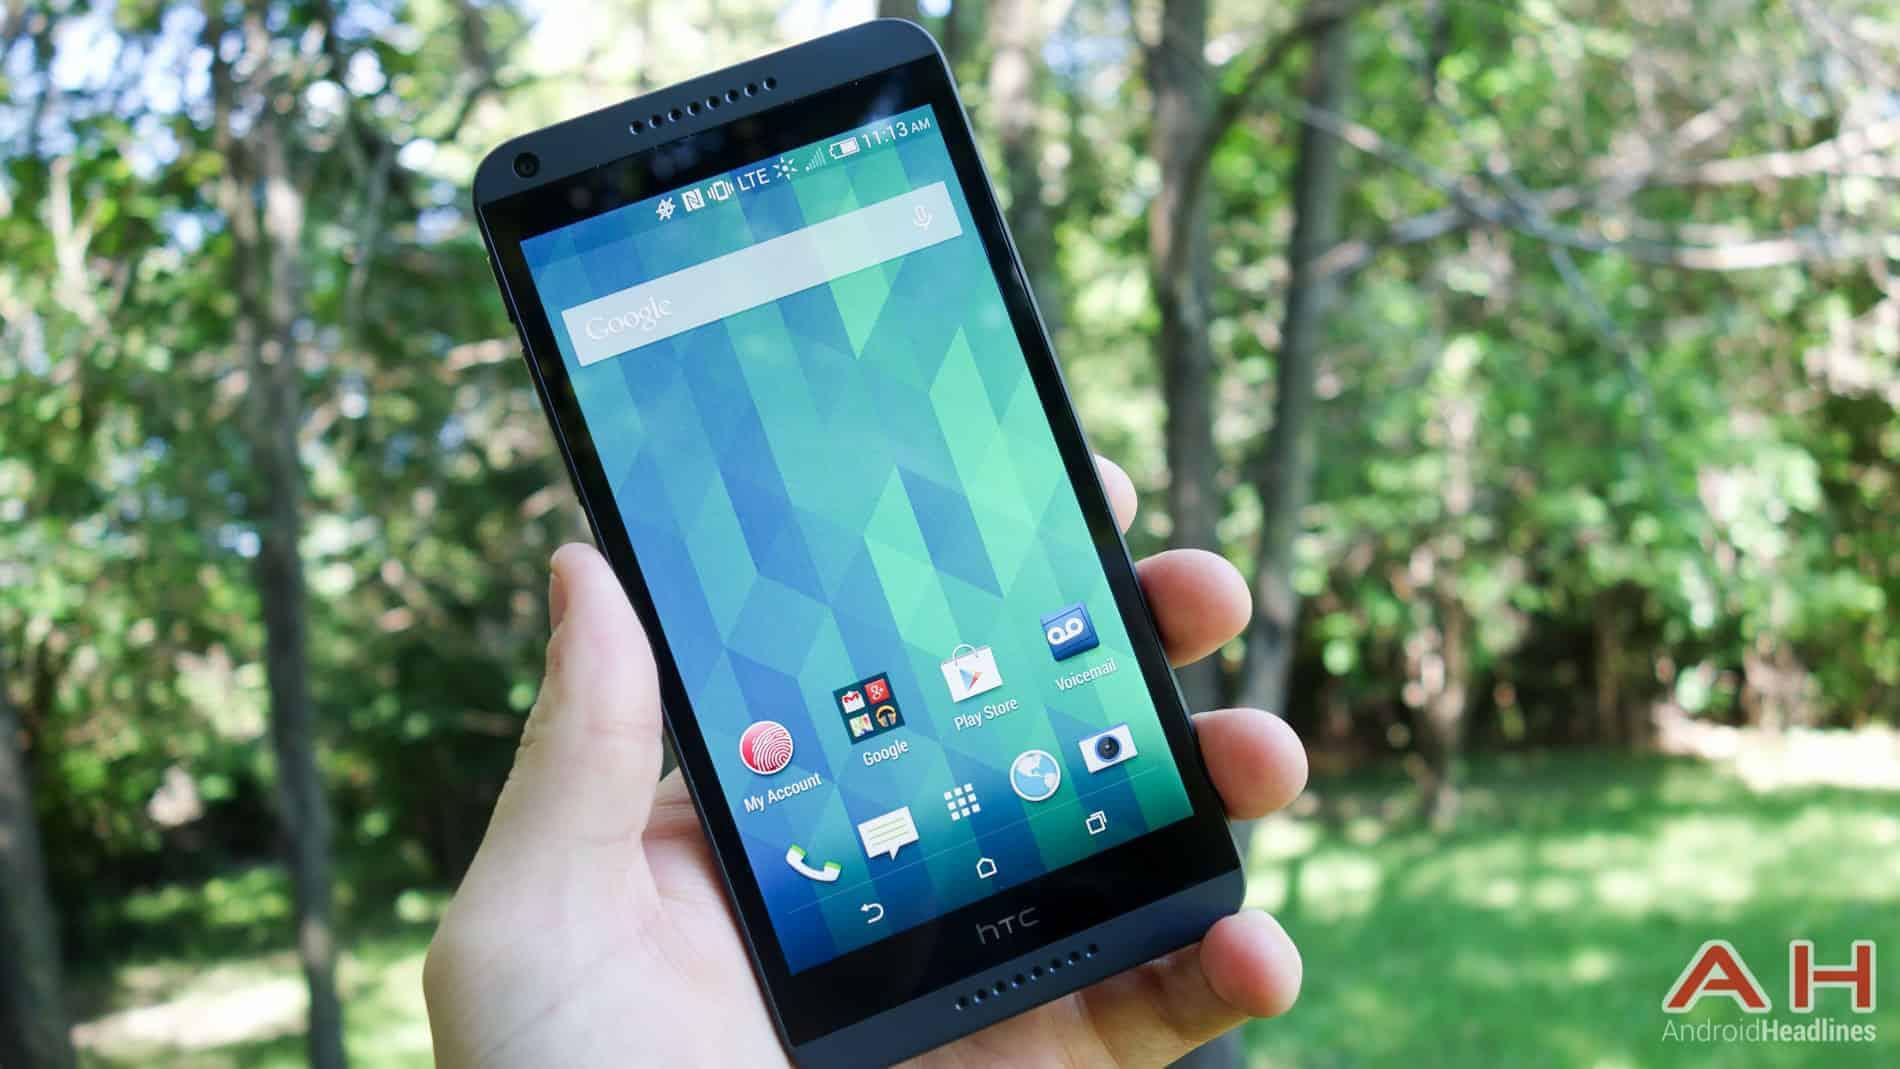 HTC-Desire-816-AH-2